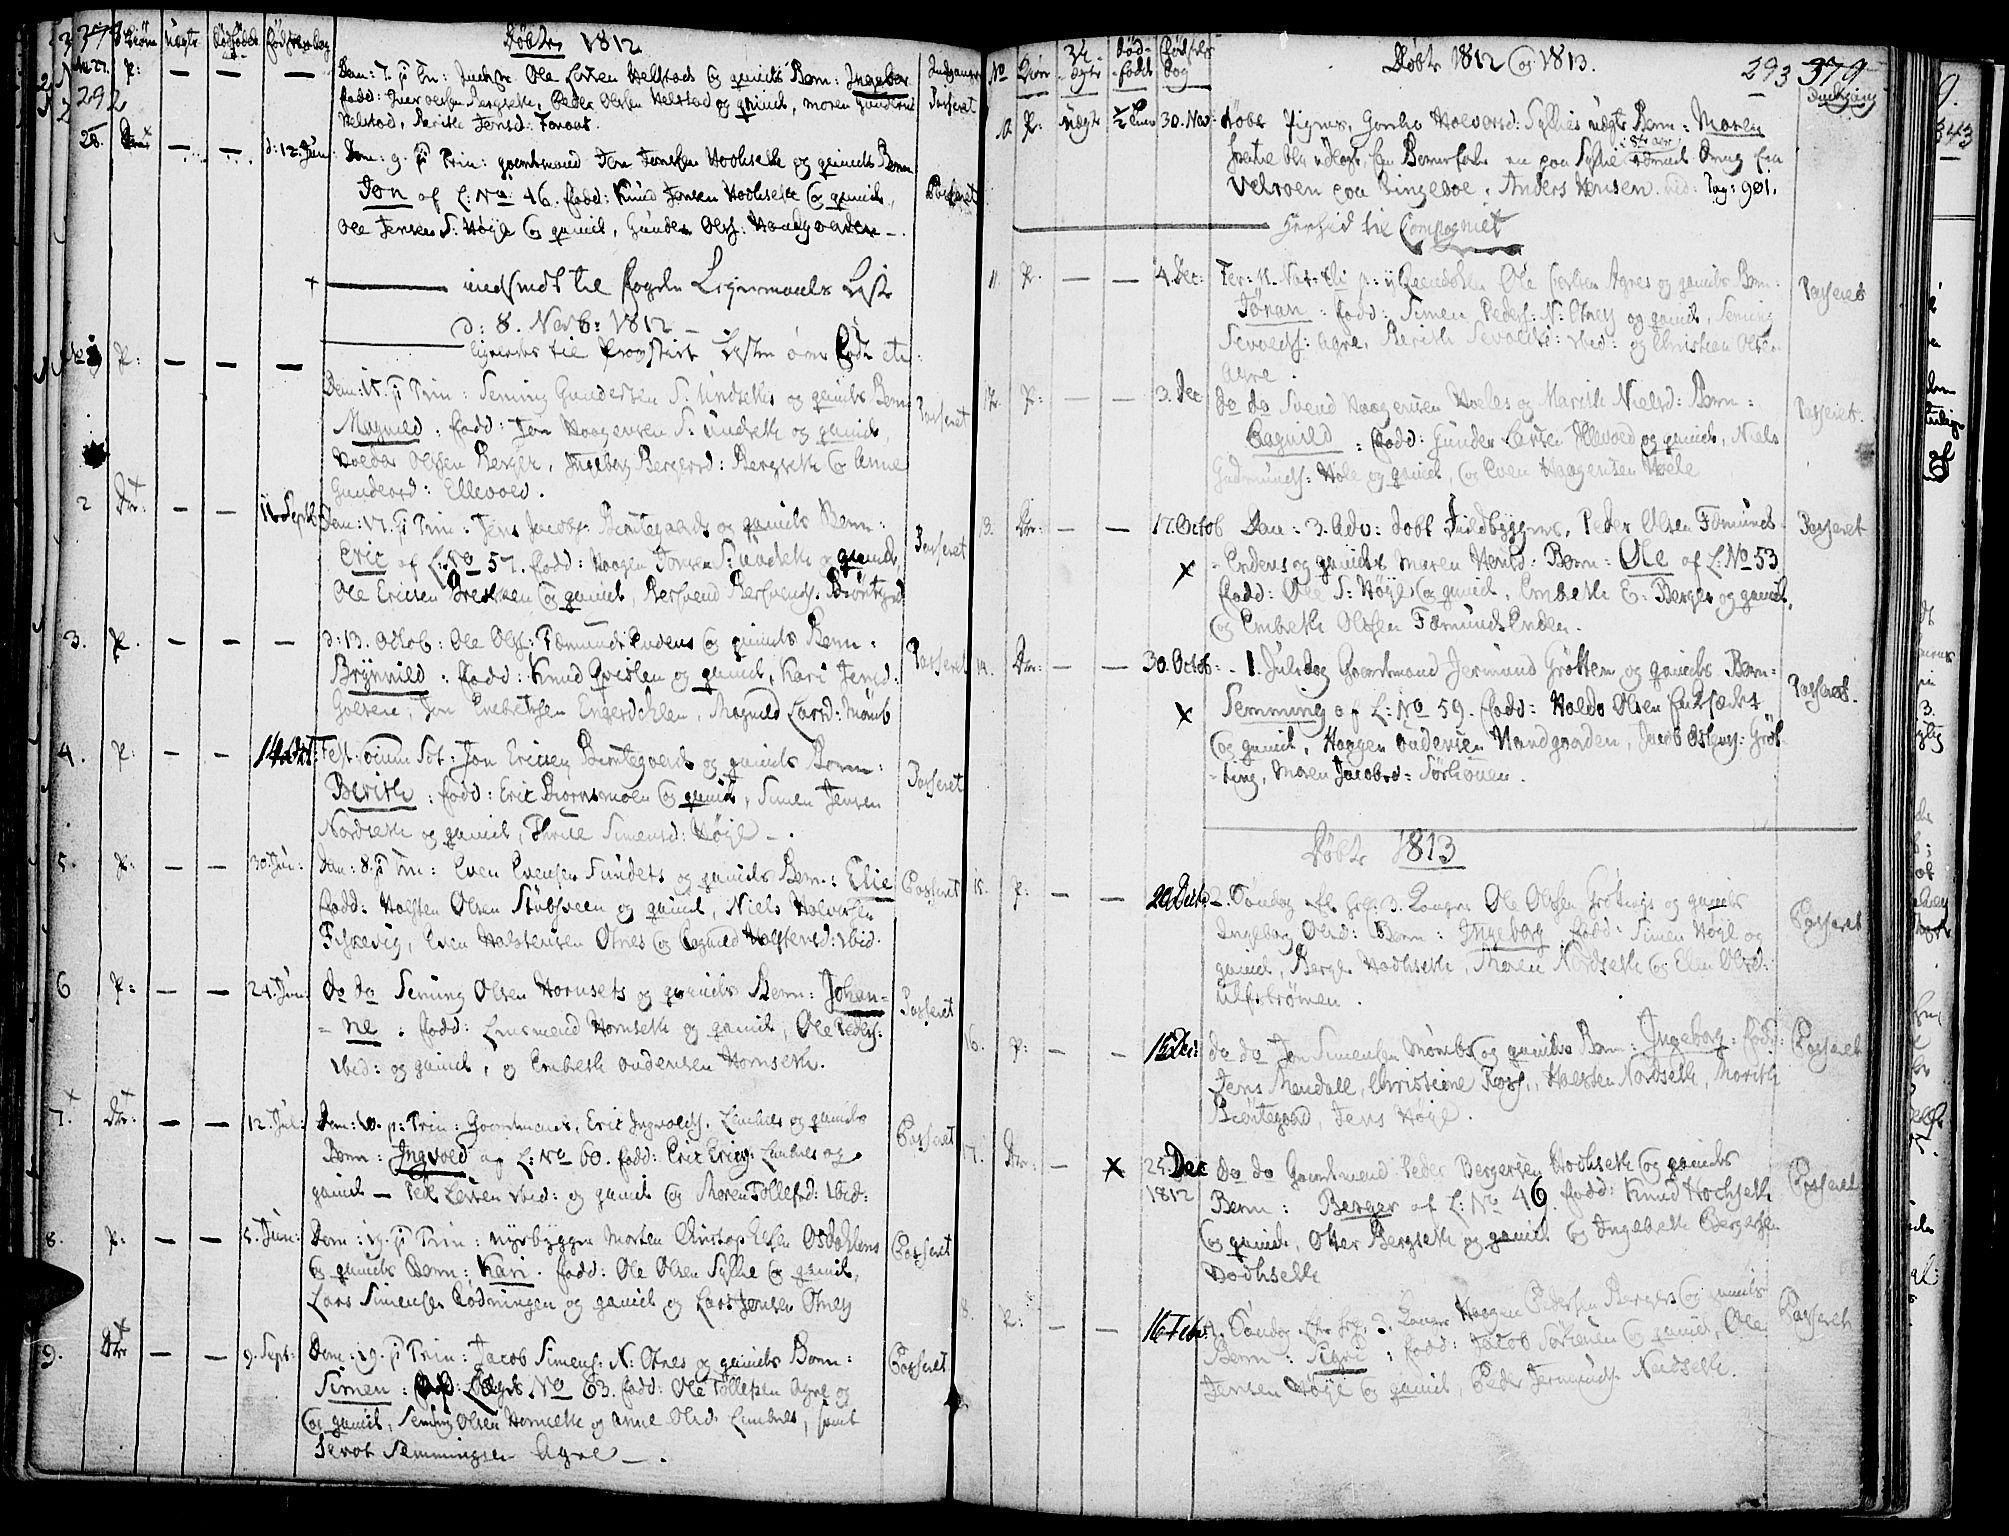 SAH, Rendalen prestekontor, H/Ha/Haa/L0002: Ministerialbok nr. 2, 1788-1814, s. 292-293